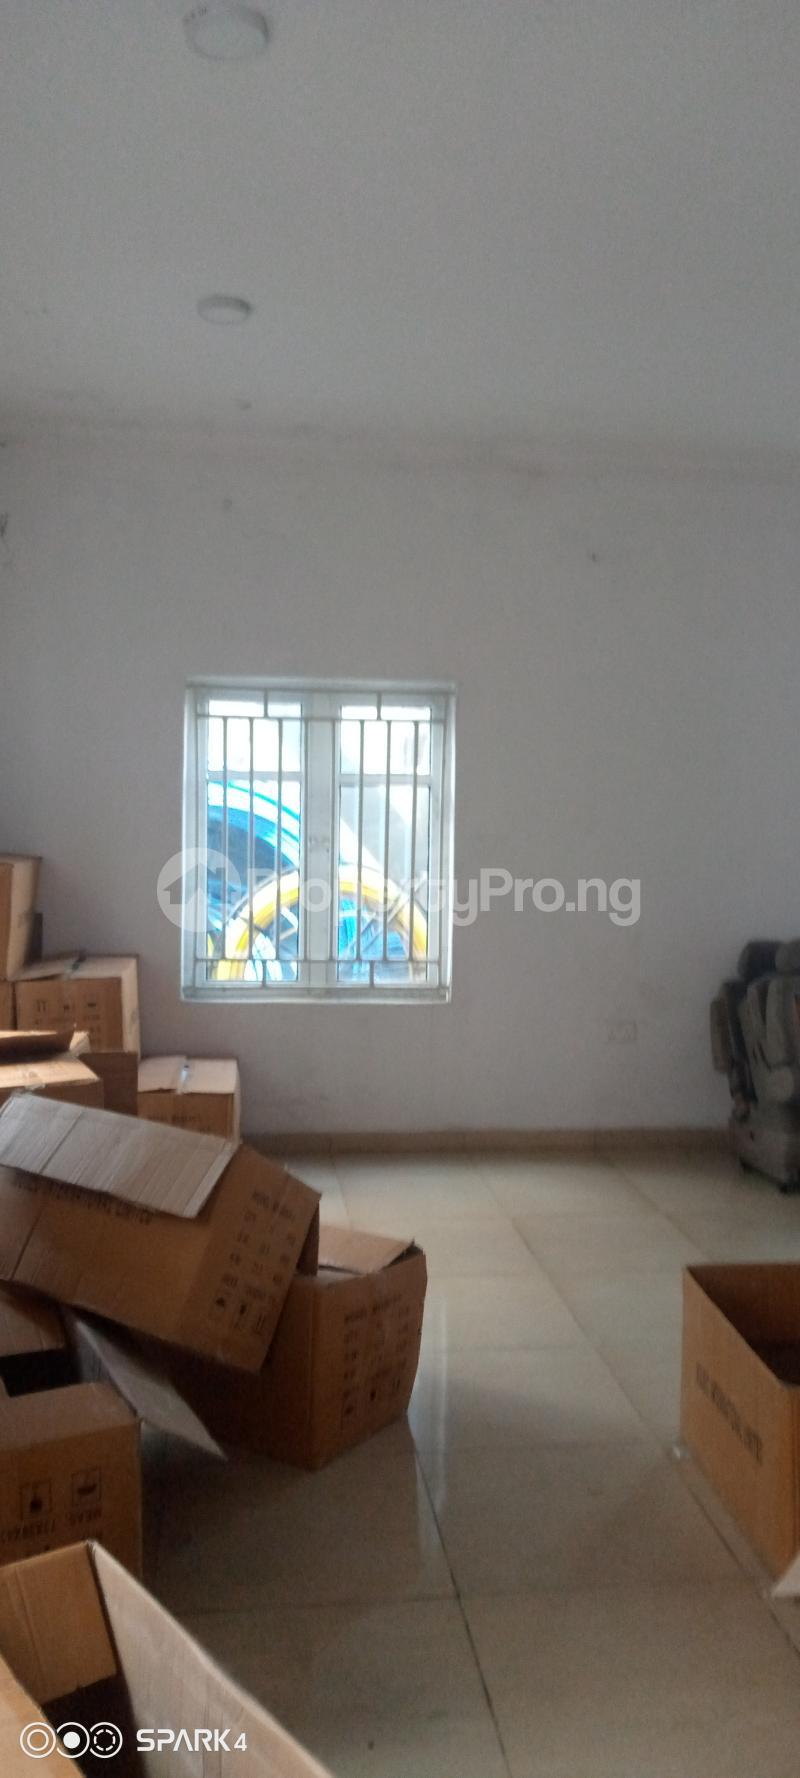 Private Office for rent Ogudu Road Ogudu Ogudu Lagos - 0